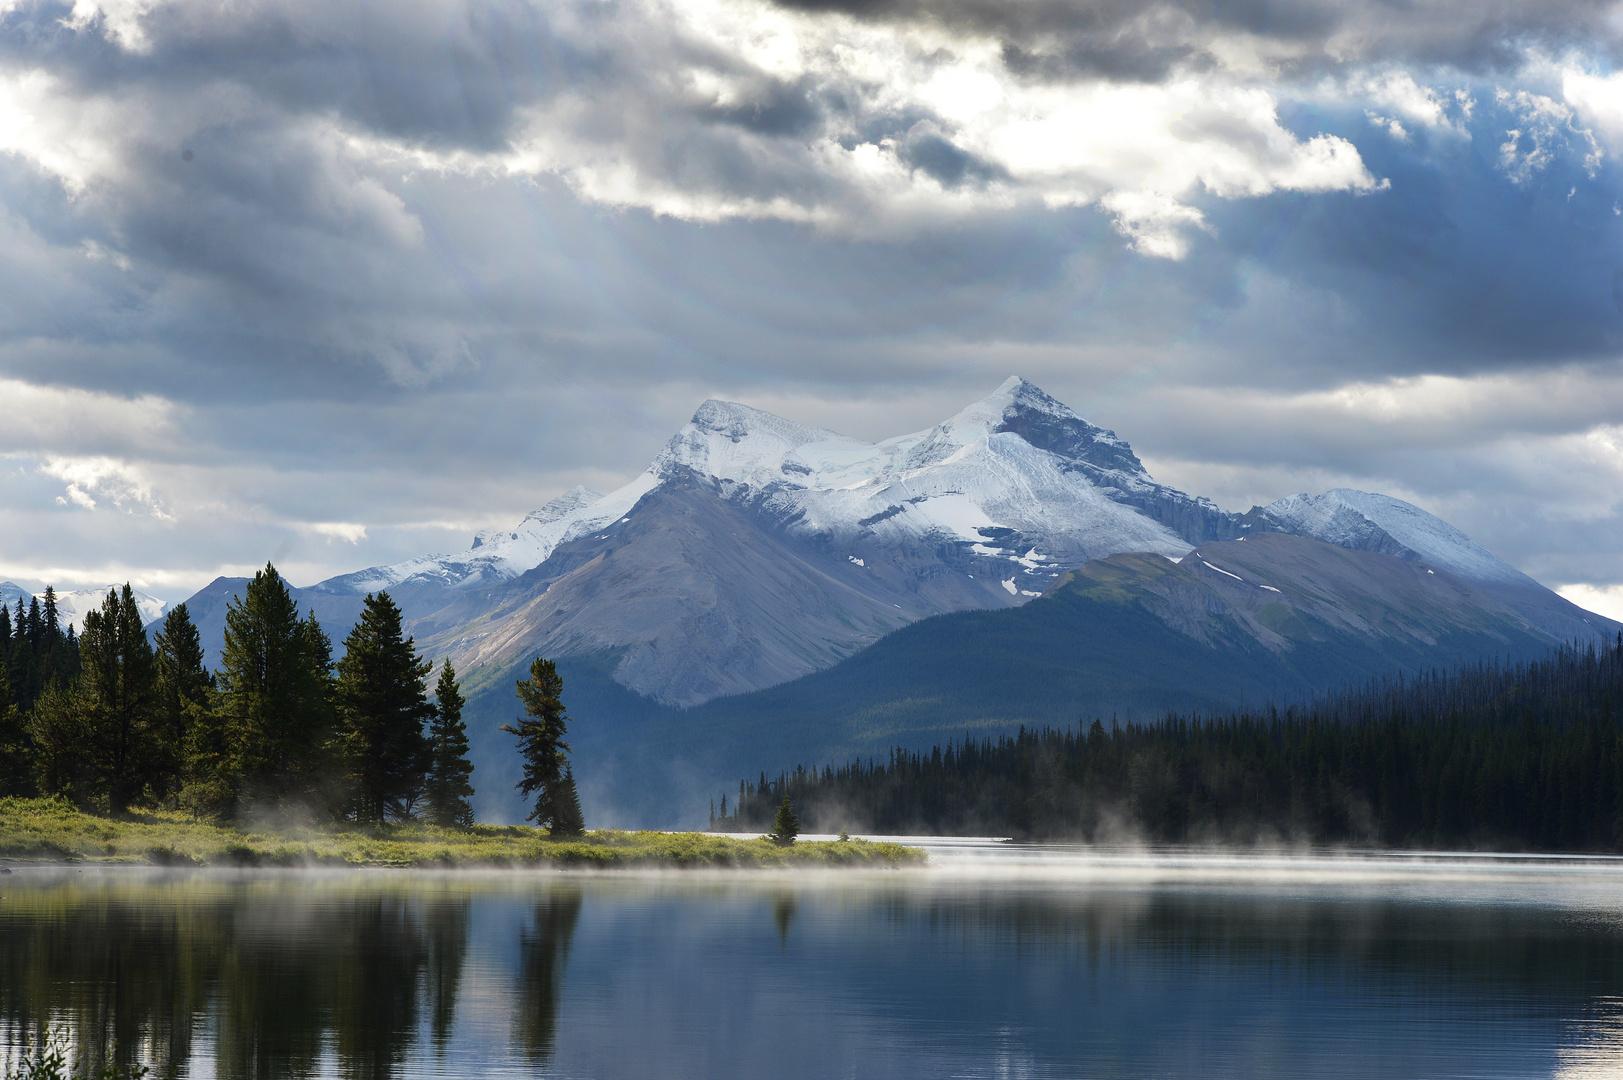 Kanada Maligne Lake 2013